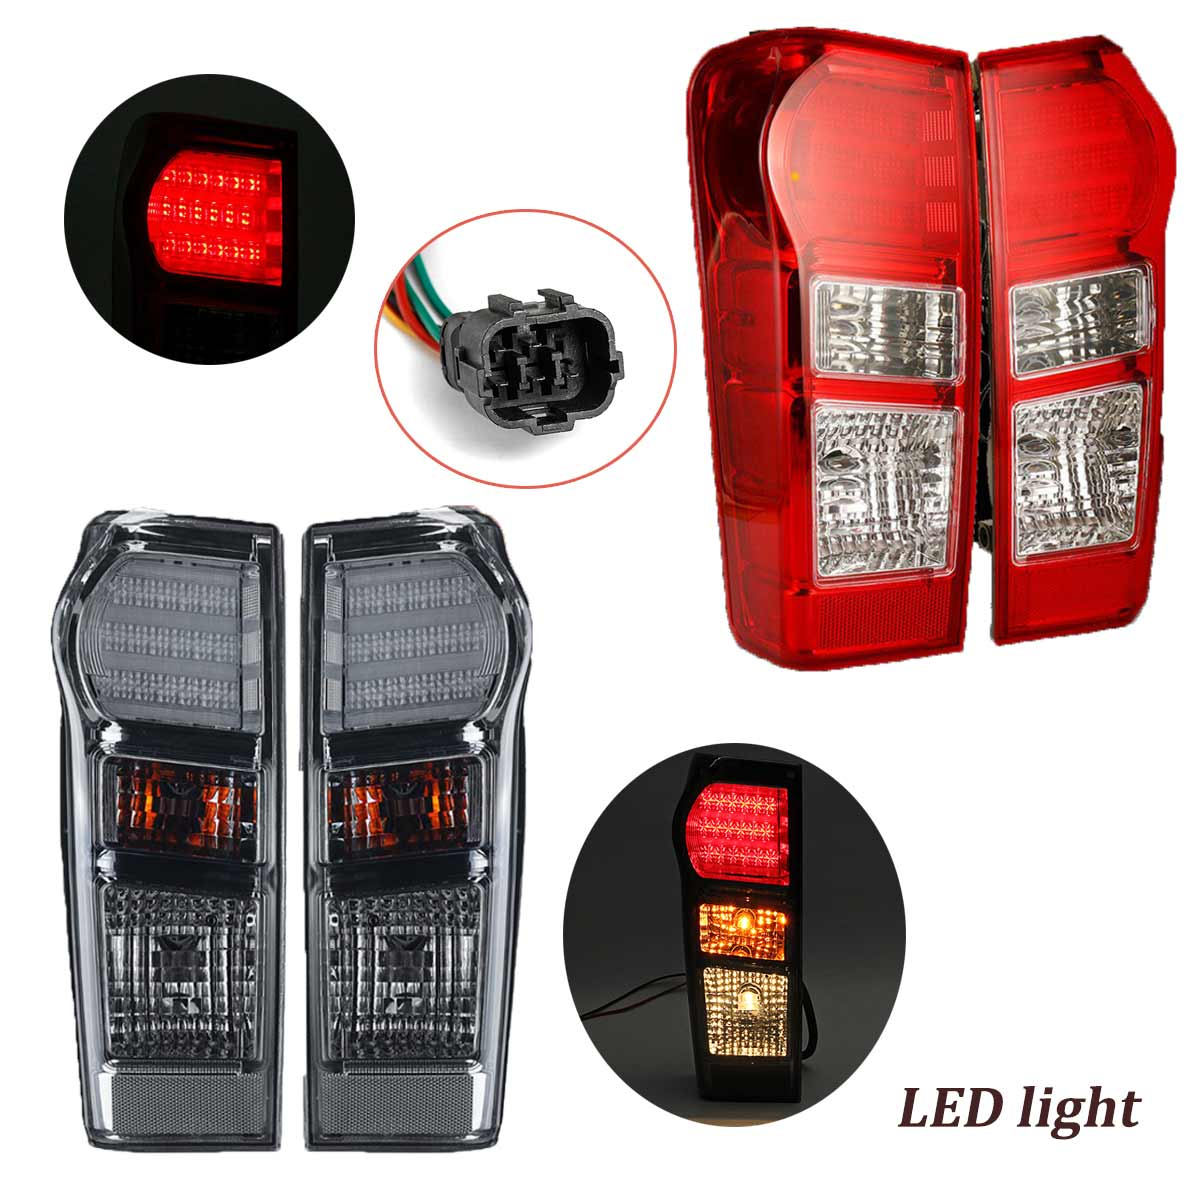 1x/2x Left/Right Rear LED Tail Light For Isuzu Dmax Yukon Utah 2012 2013 2014 2015 2016 2017 2018 w/ wire Harness1x/2x Left/Right Rear LED Tail Light For Isuzu Dmax Yukon Utah 2012 2013 2014 2015 2016 2017 2018 w/ wire Harness